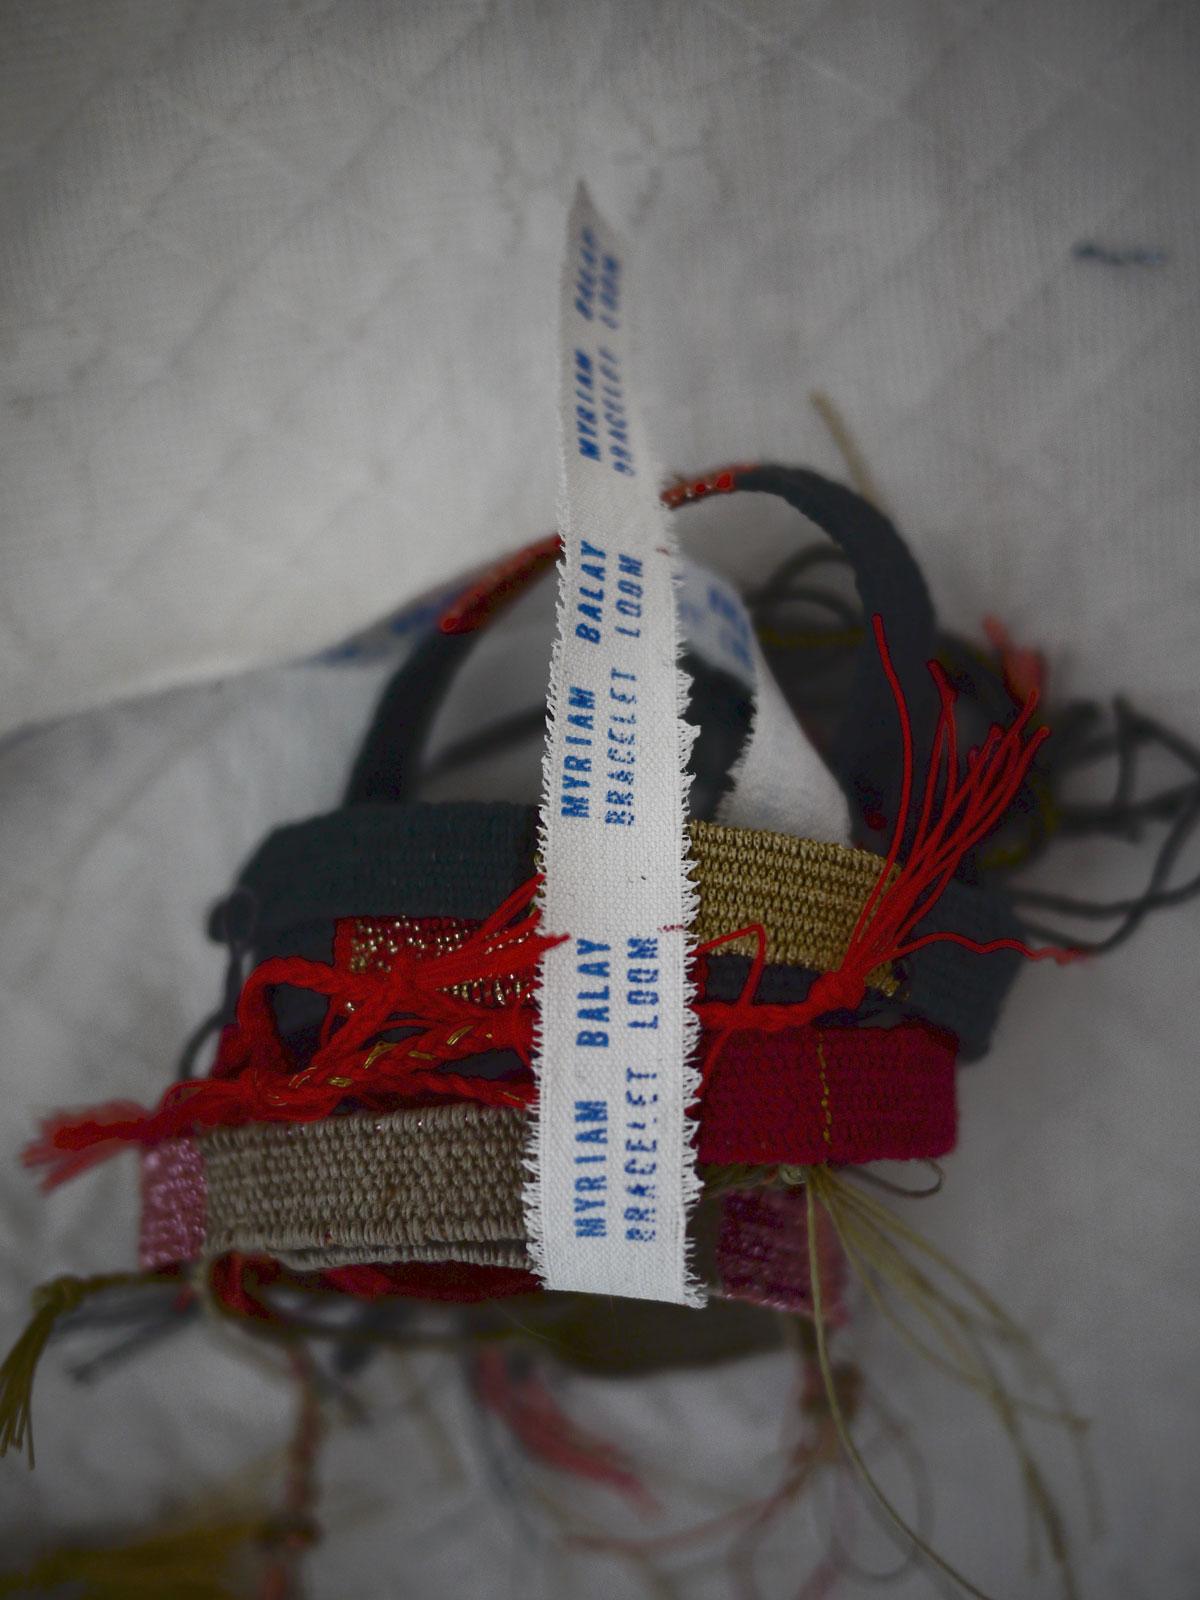 Bracelets LOOM - Design textile by Myriam Balaÿ myriam-balay-merci DETAILS L'appartement